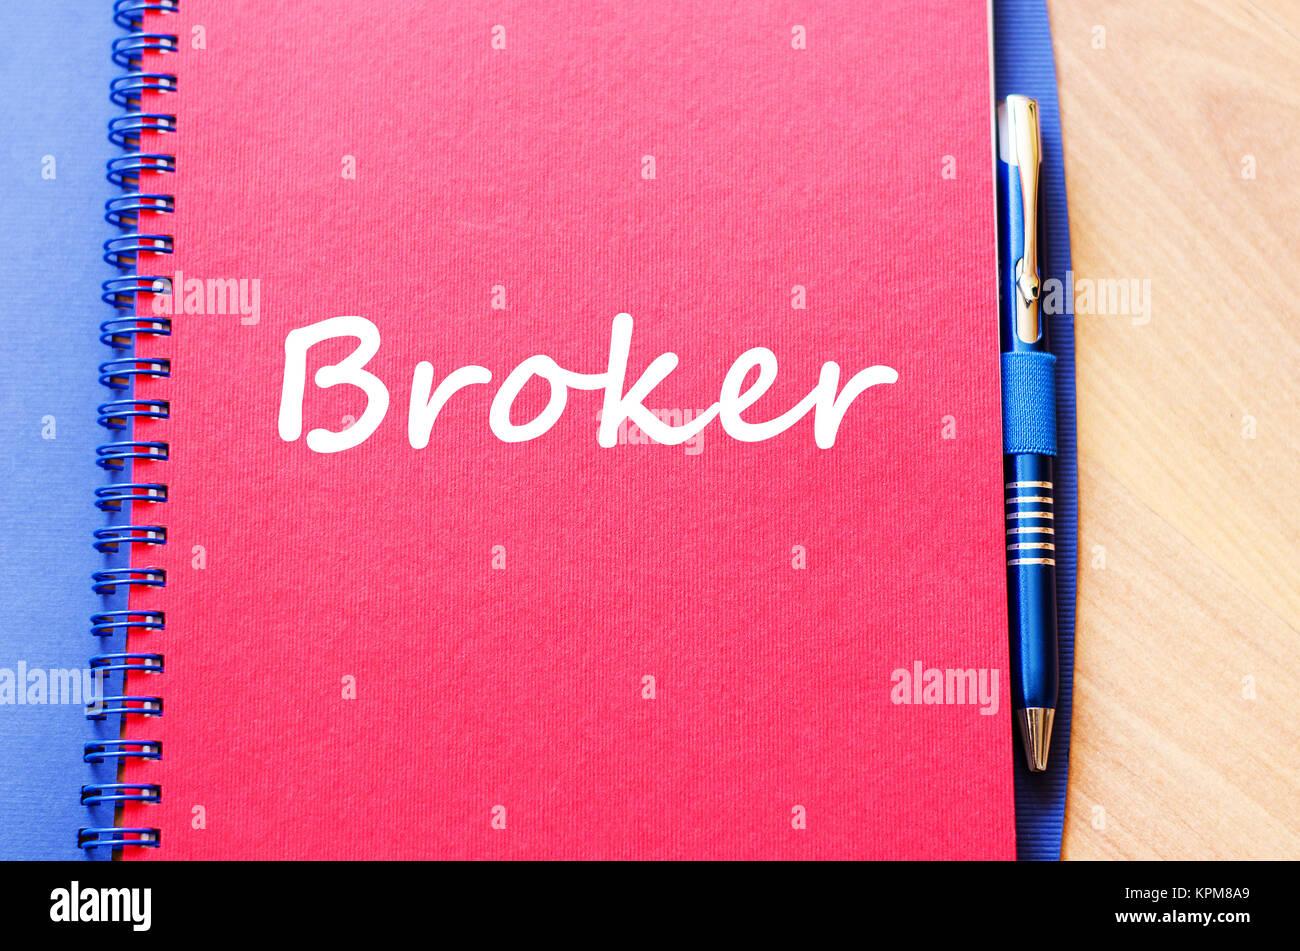 Broker write on notebook - Stock Image